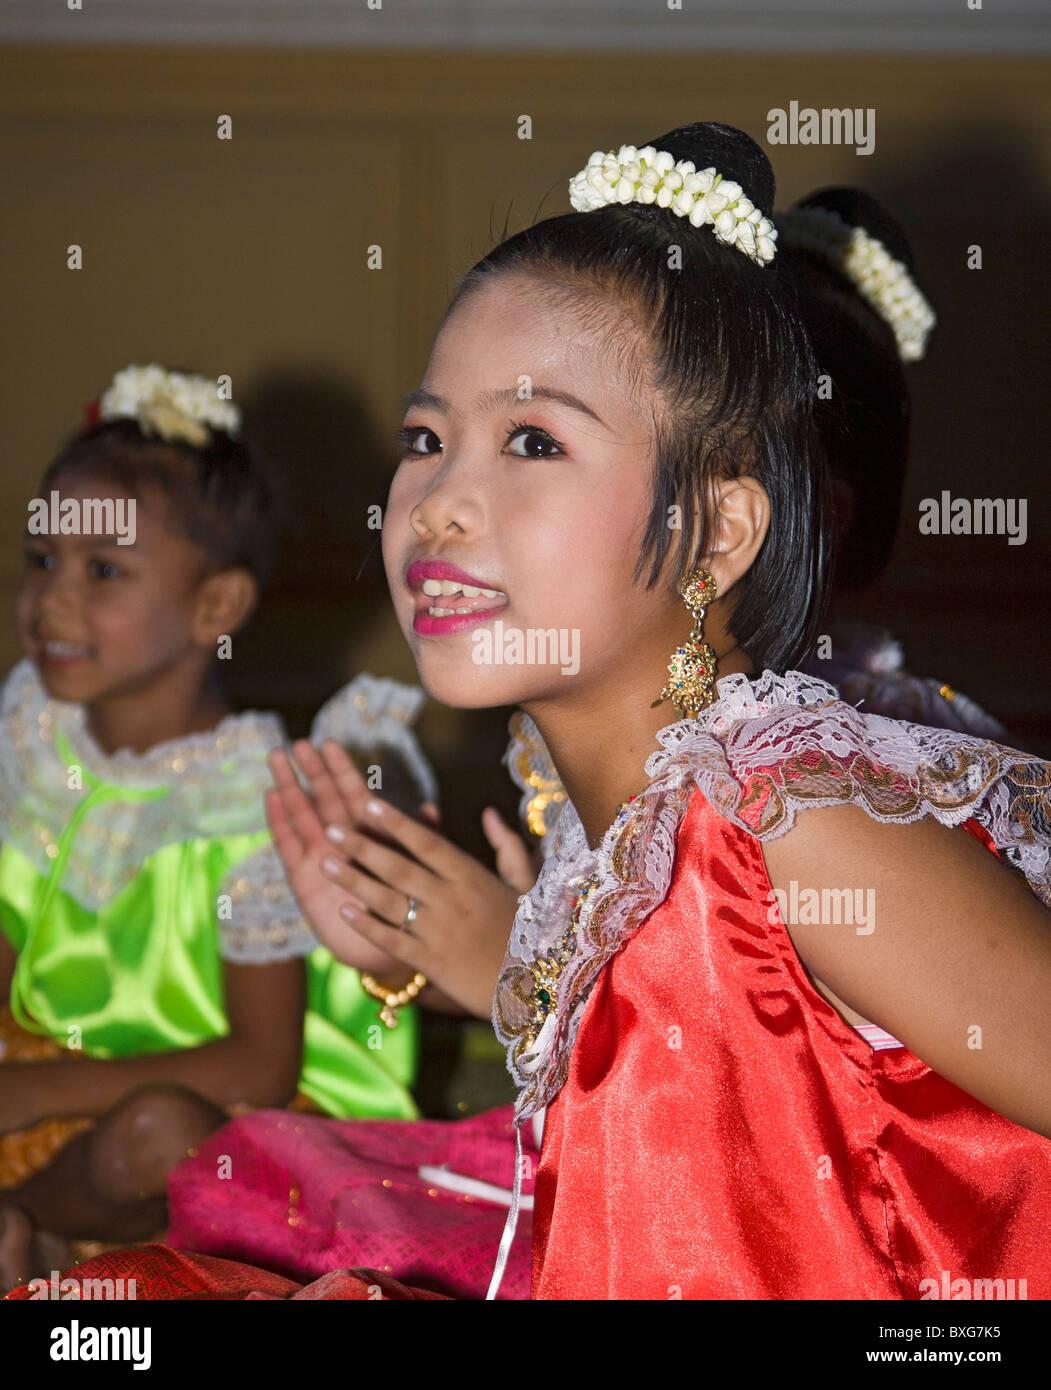 Junge Thai Kinder in Tracht an Thailand Tourismus Behörde Golden Jubilee Grand Rezeption; Bangkok, Thailand. Stockbild